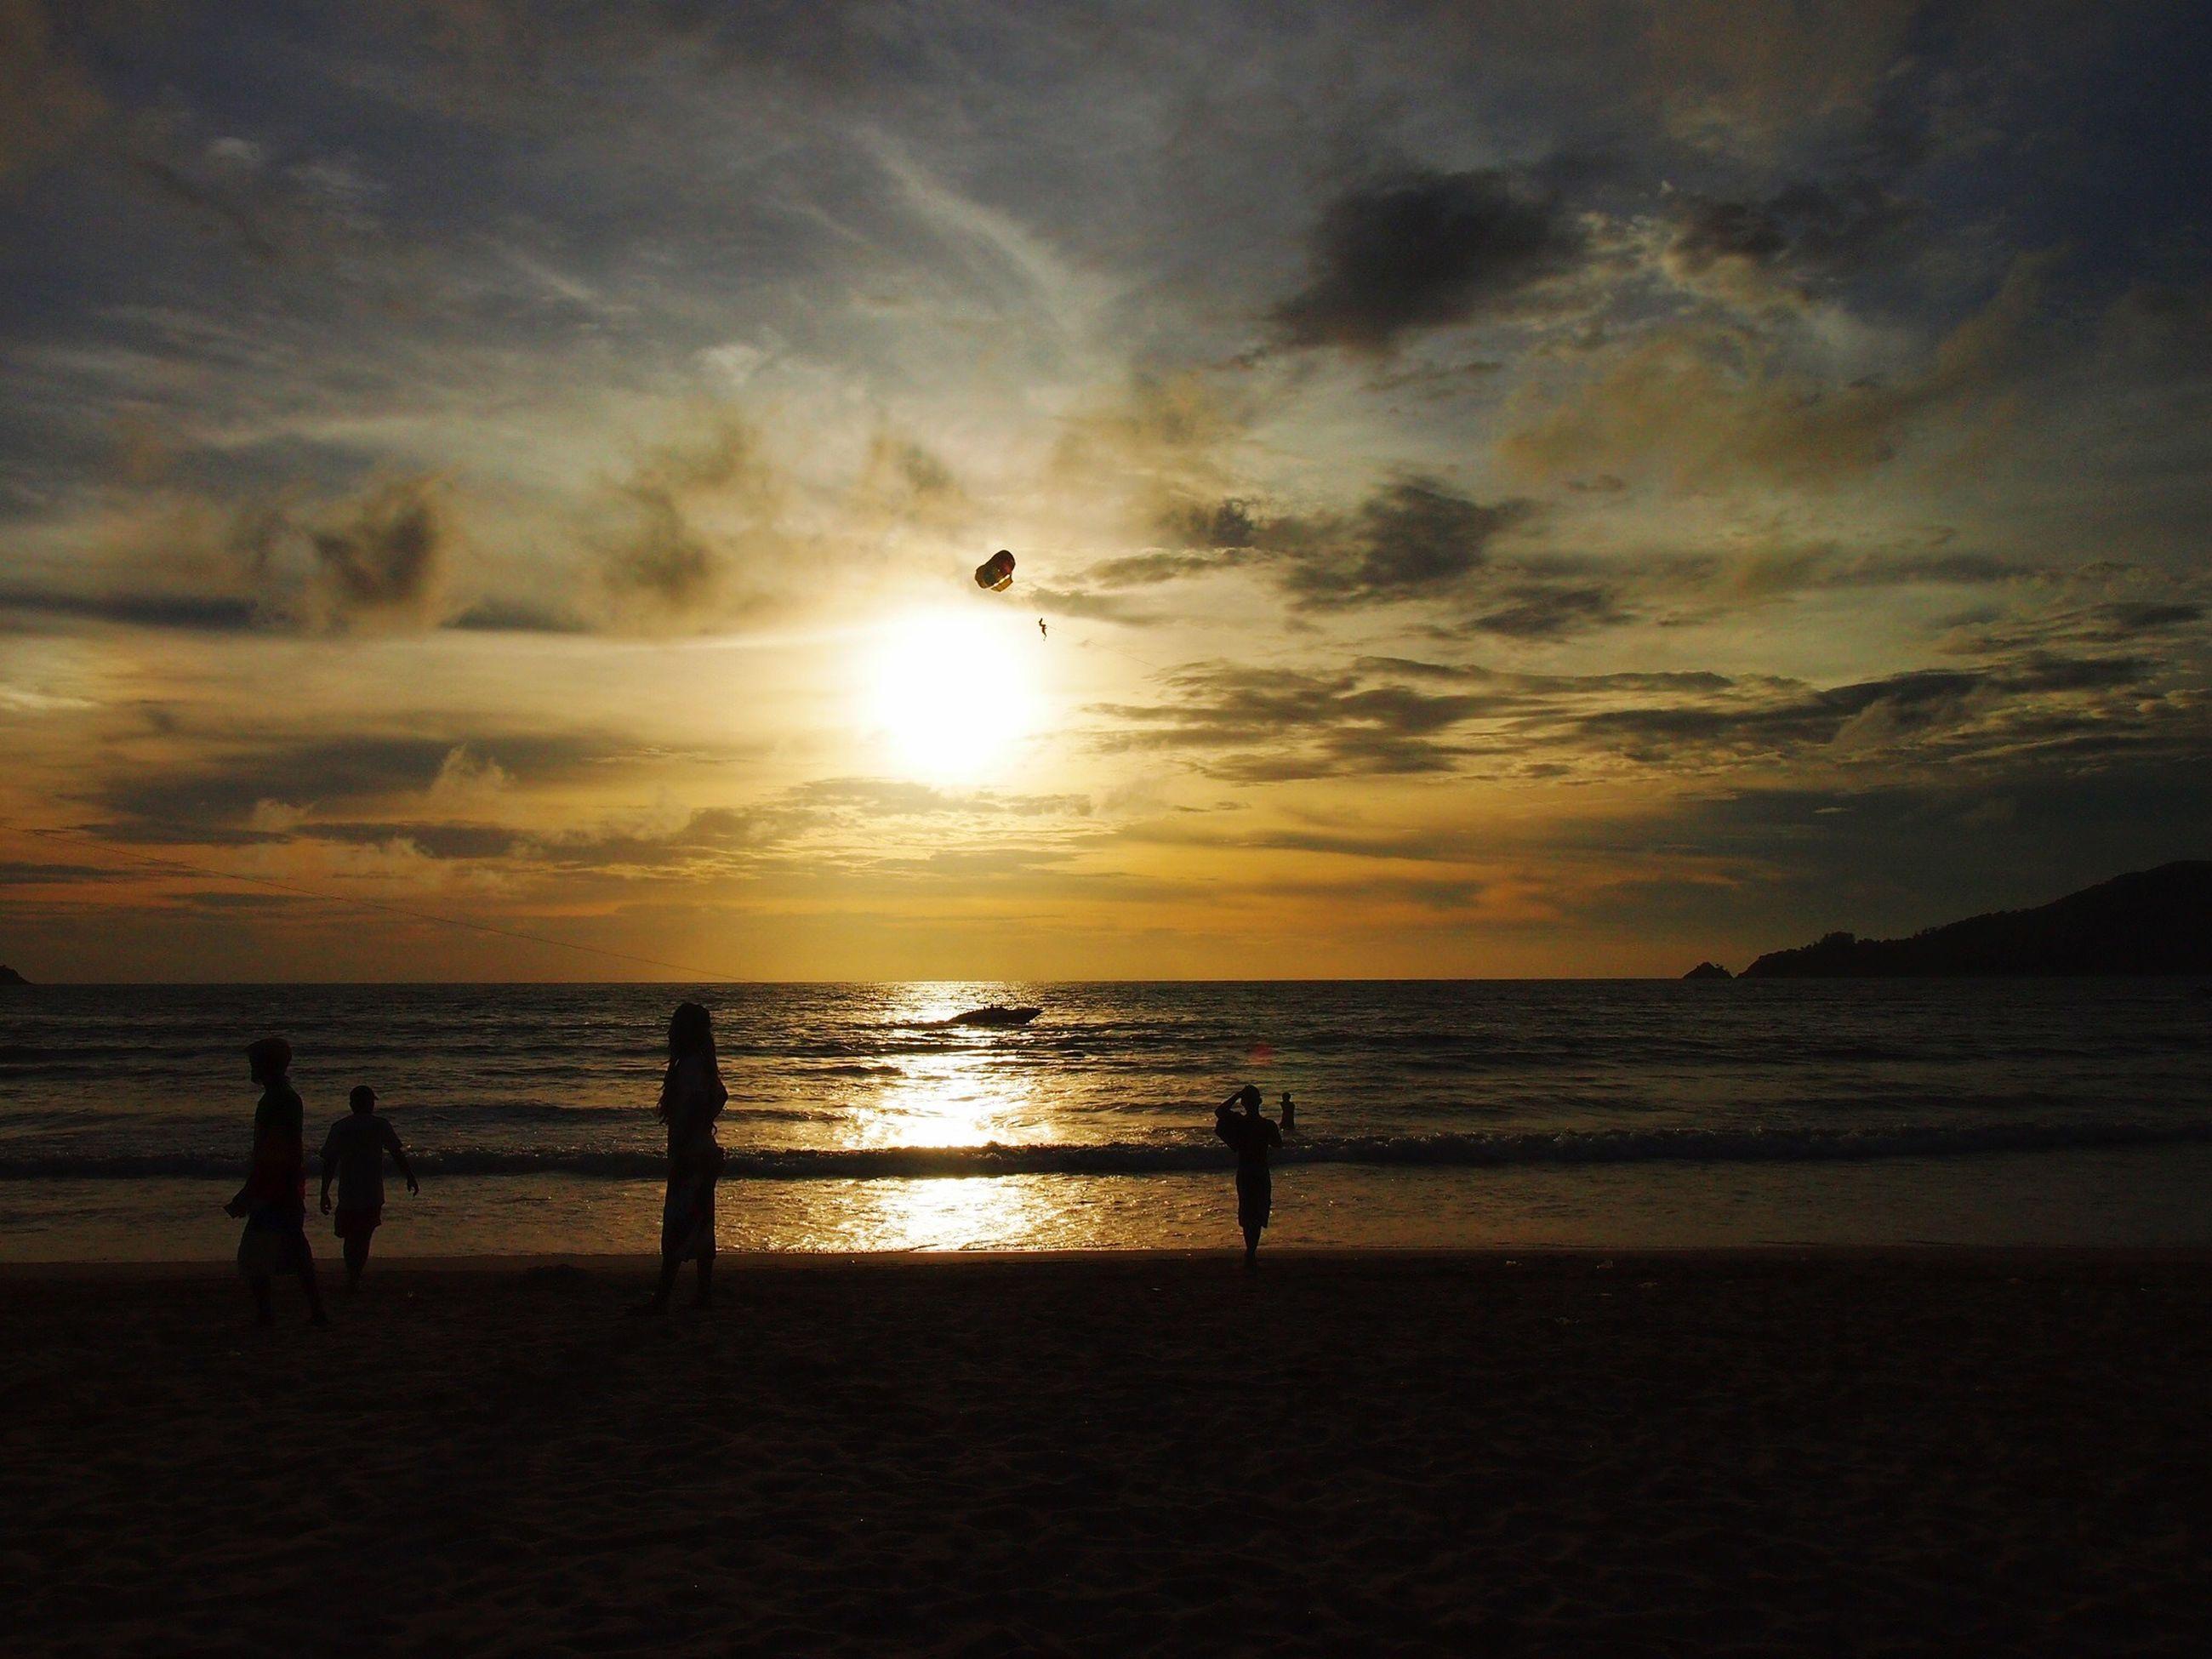 sea, sunset, horizon over water, water, sky, beach, silhouette, sun, scenics, cloud - sky, beauty in nature, shore, tranquil scene, tranquility, idyllic, nature, cloud, orange color, leisure activity